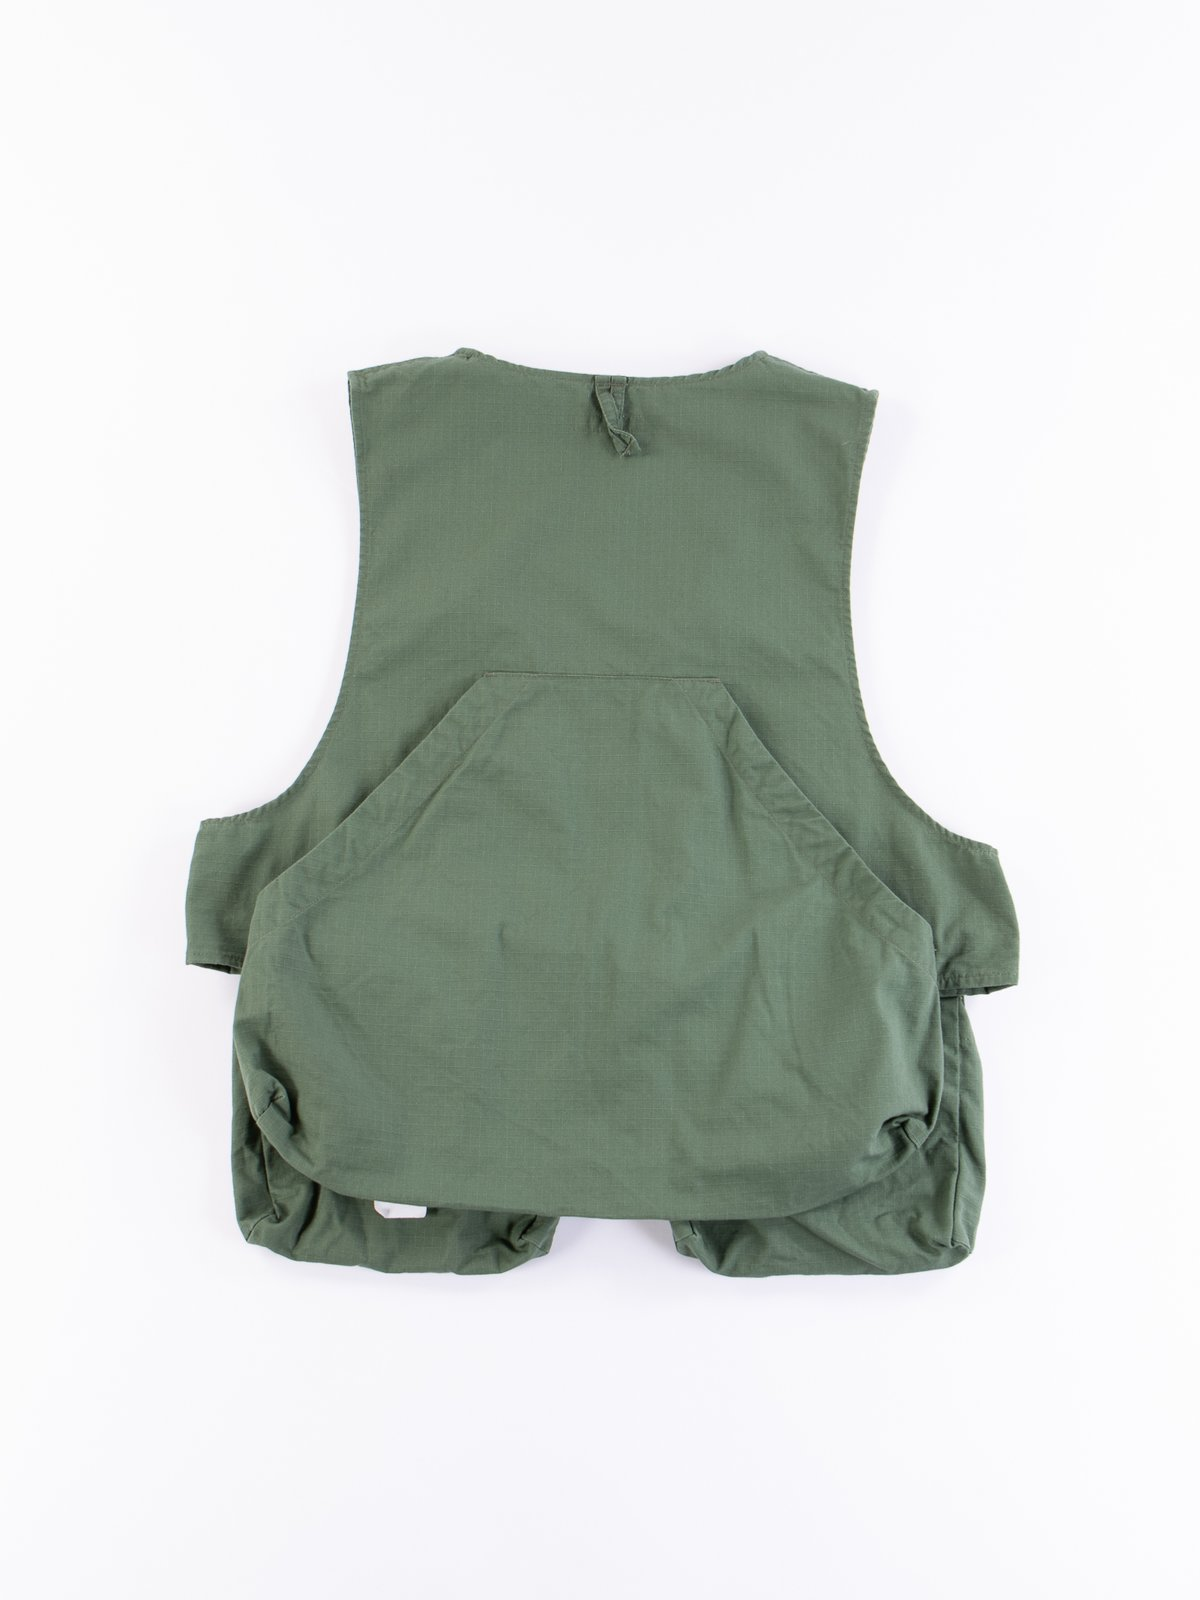 Olive Cotton Ripstop Fowl Vest - Image 5